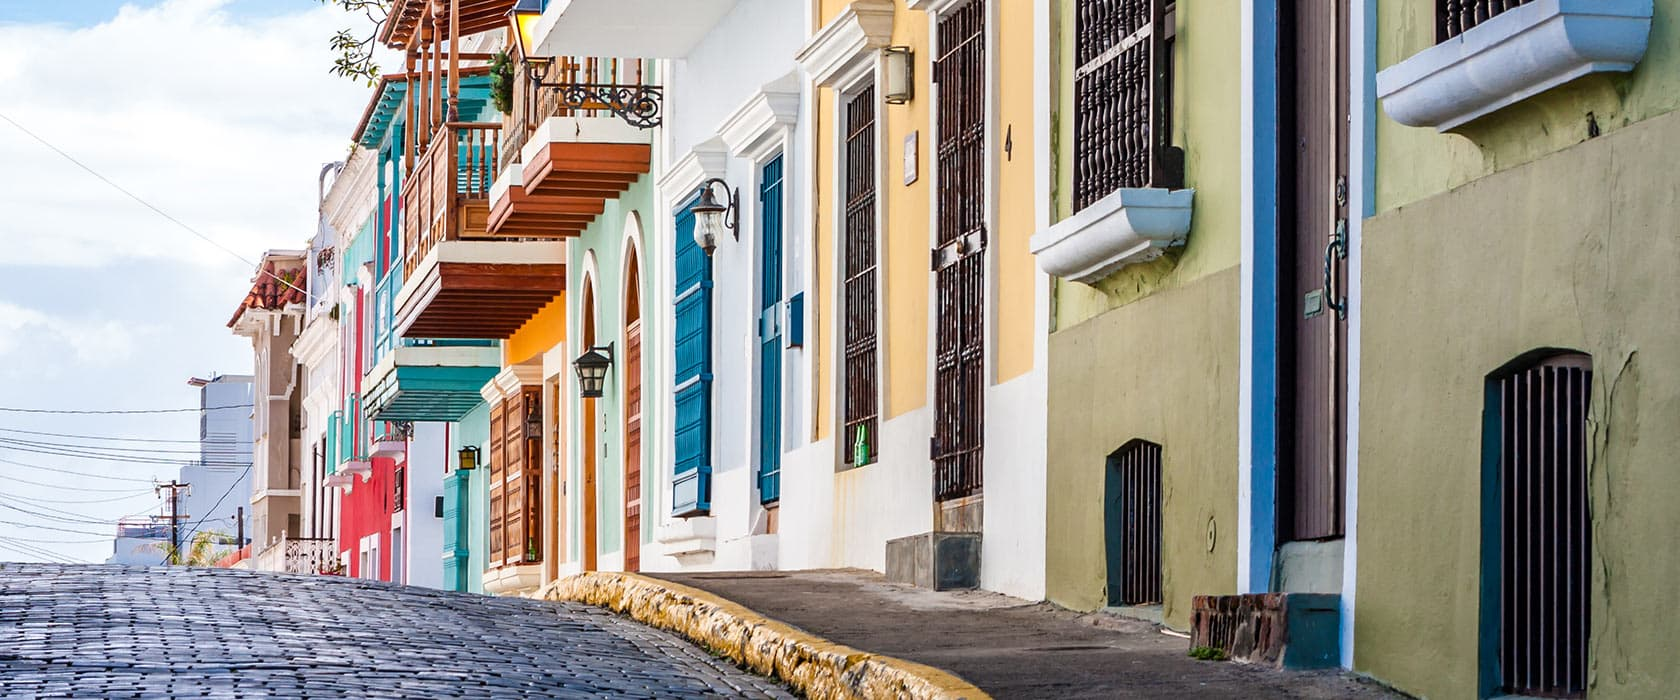 Caribe hilton attractions activities san juan puerto rico for Armadi california porto rico